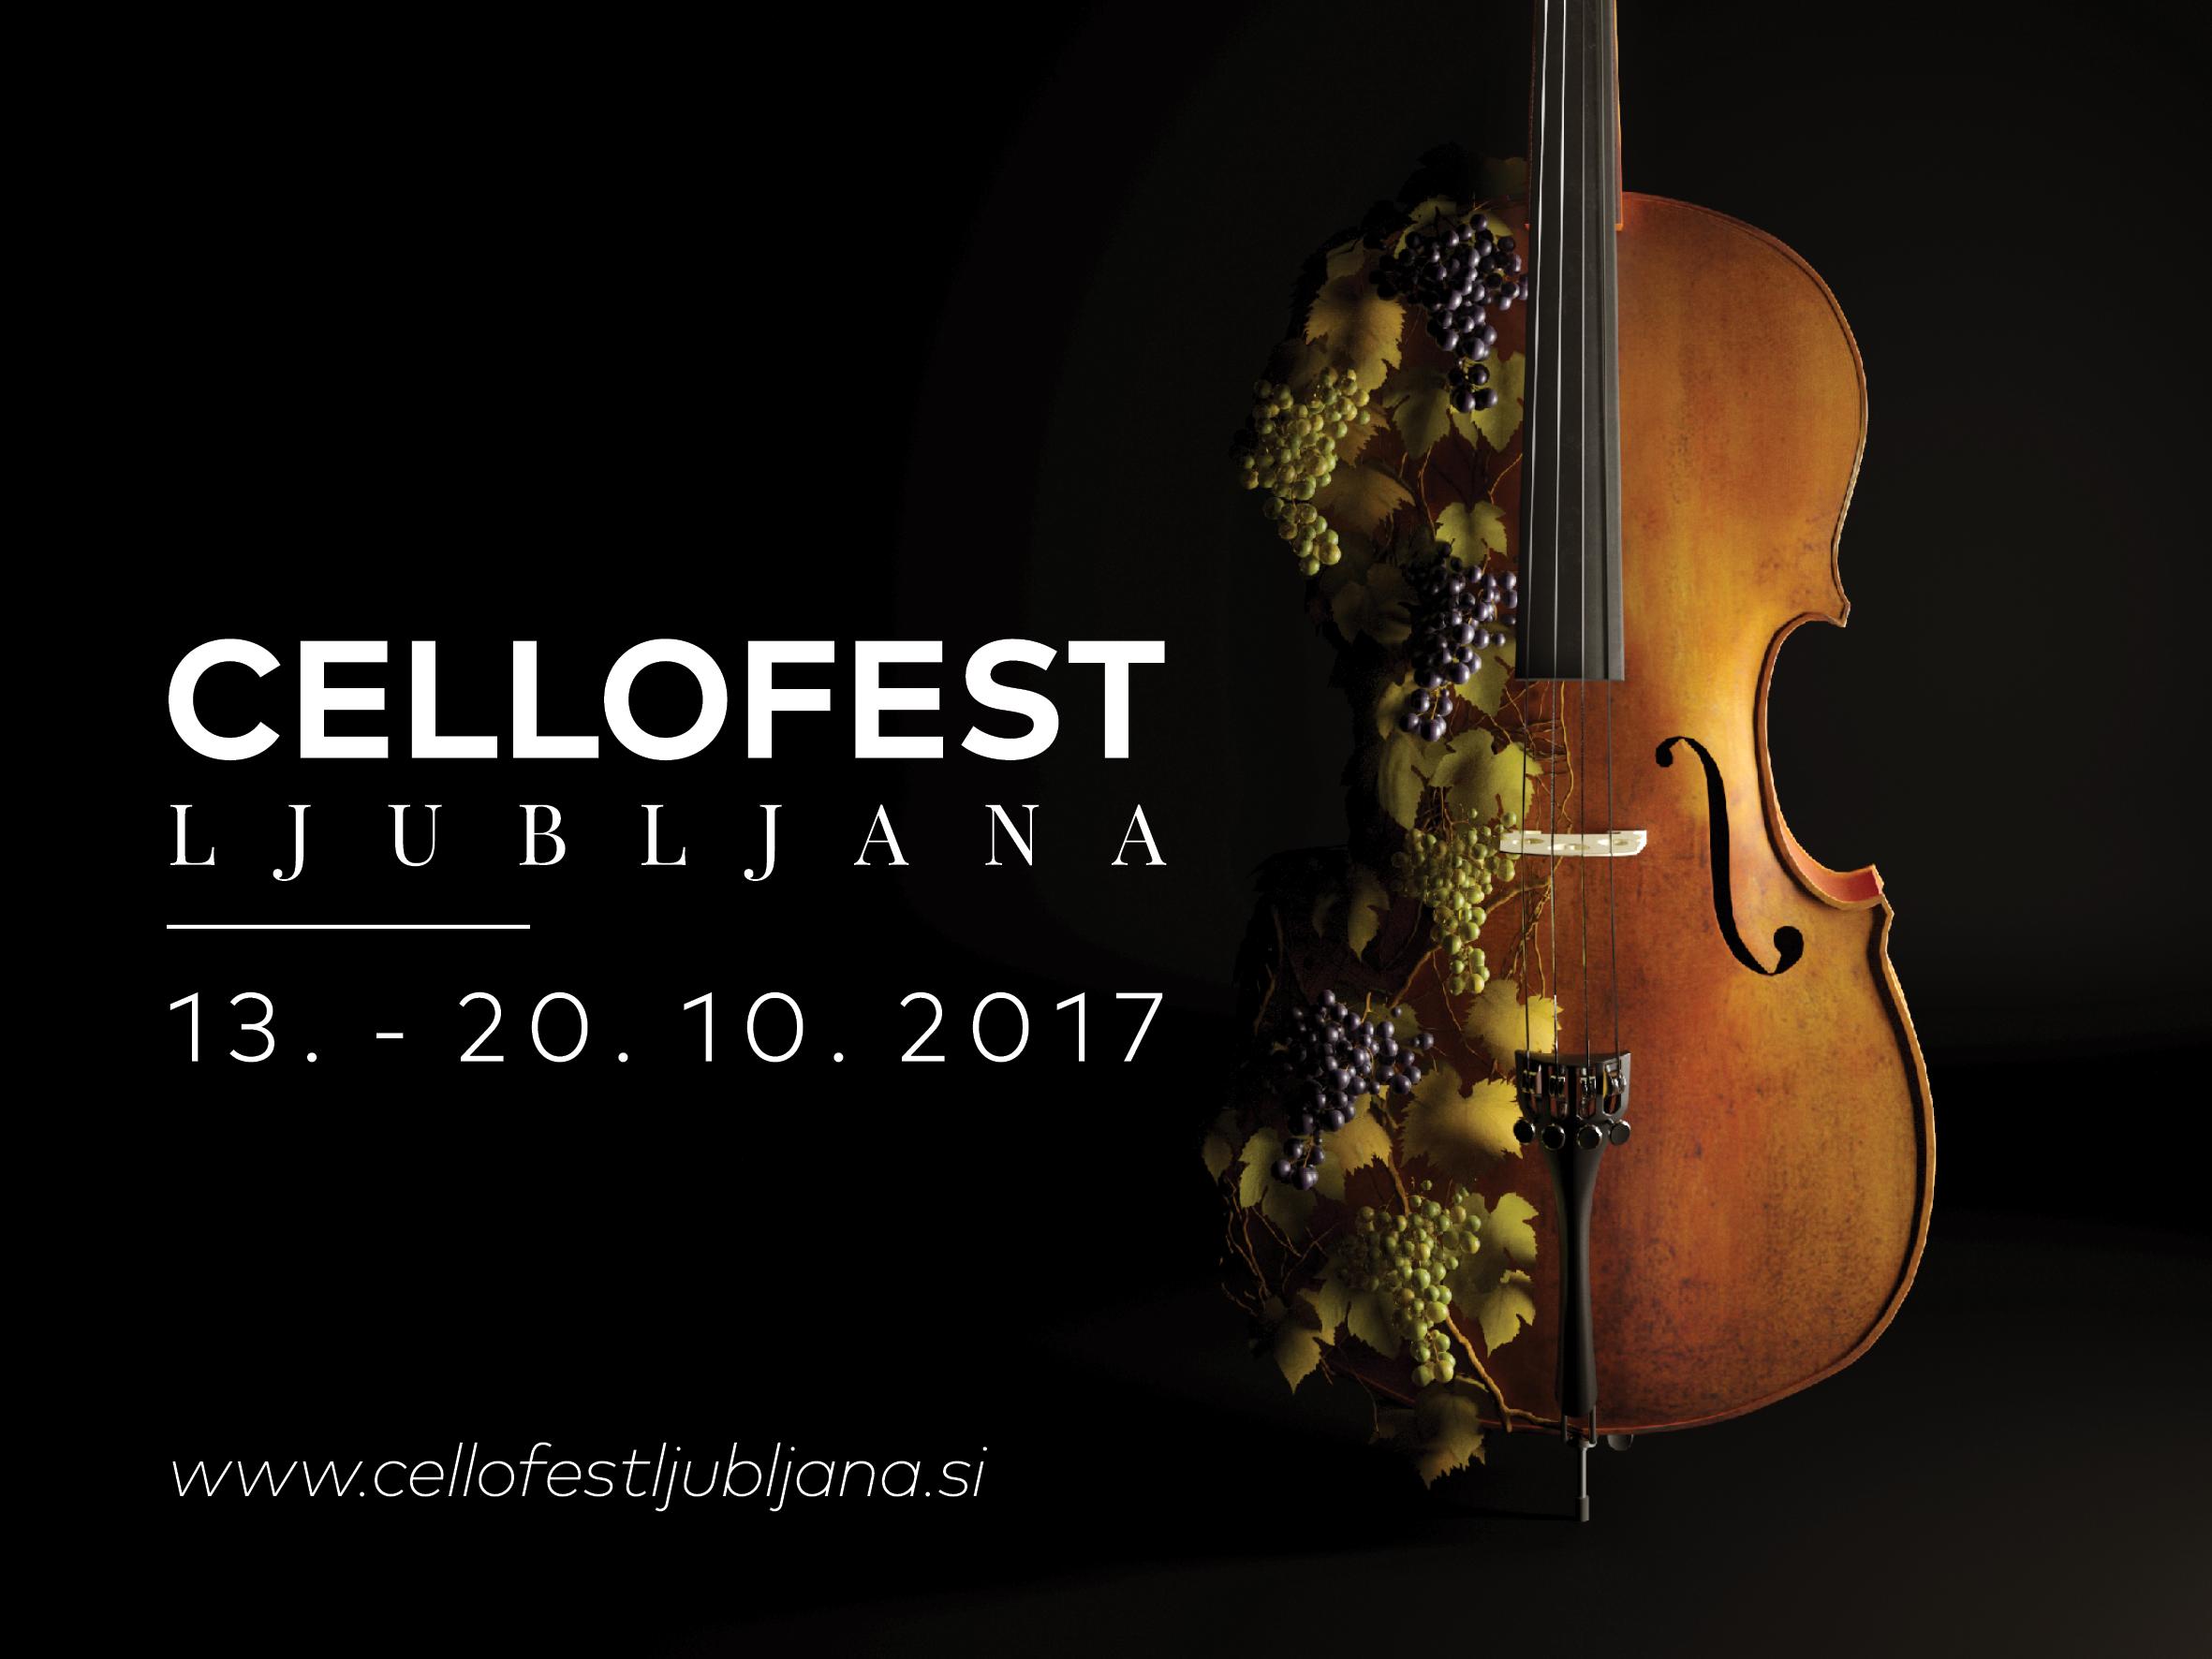 cellofest_jumbo_1.1.png